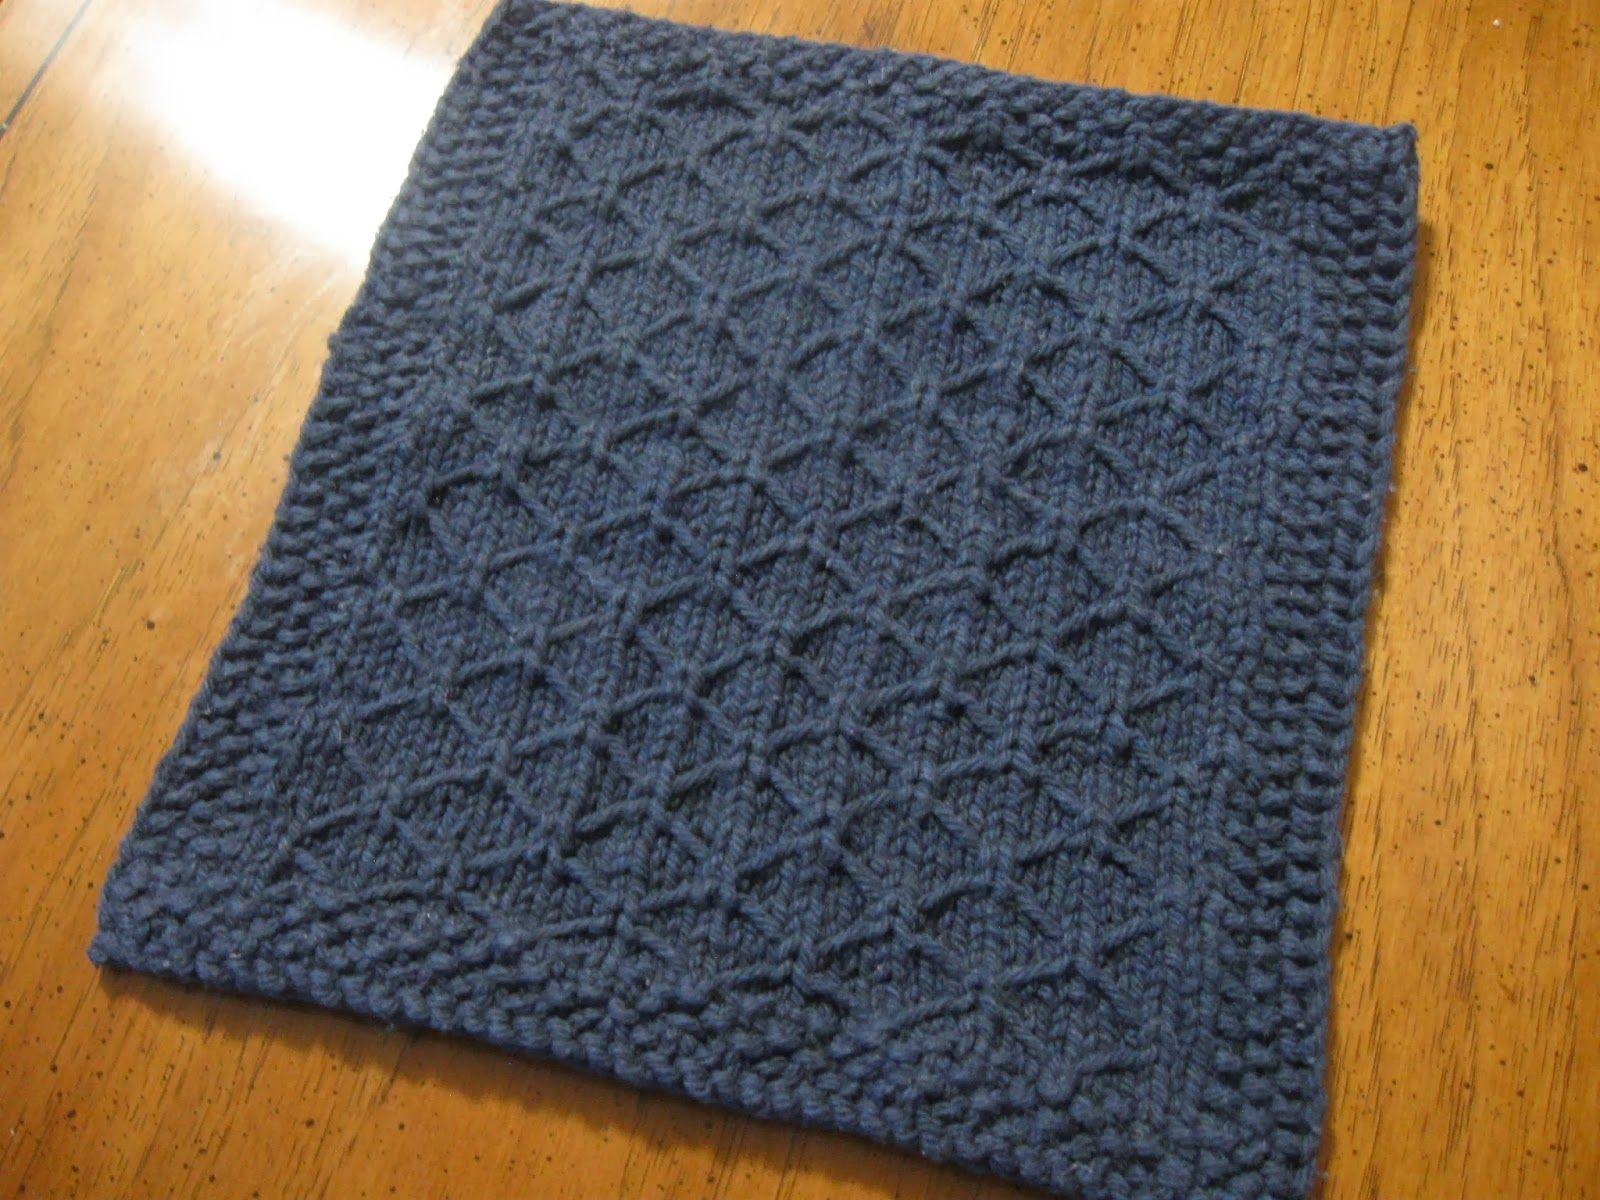 Smocking | Dishcloth knitting patterns, Knitted washcloth ...